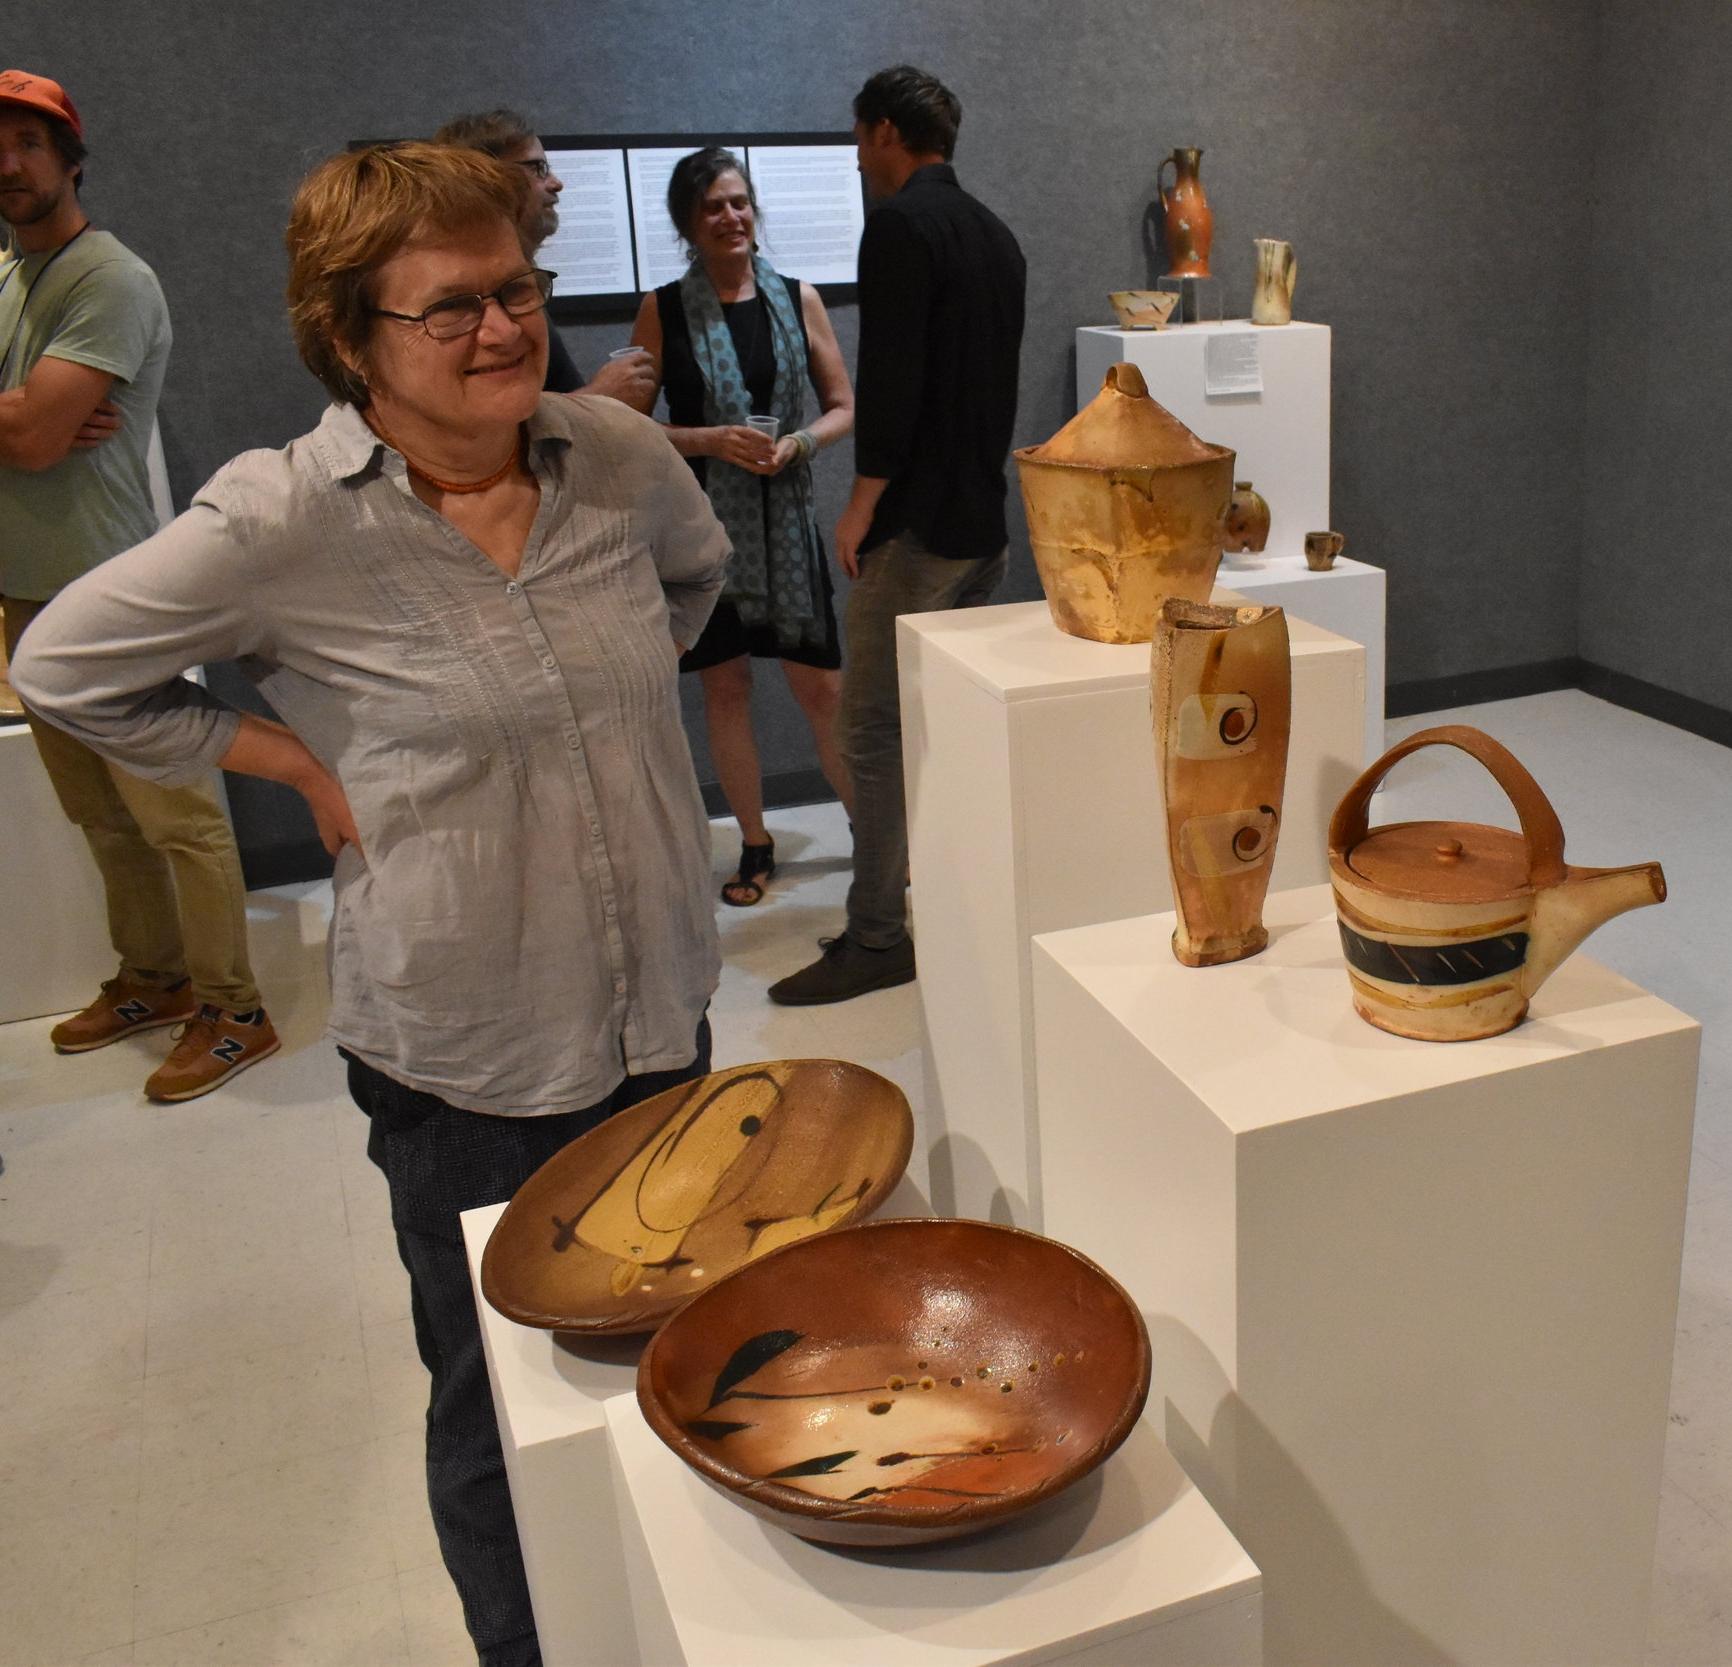 Australian potter Sandy Lockwood, observing the pots.